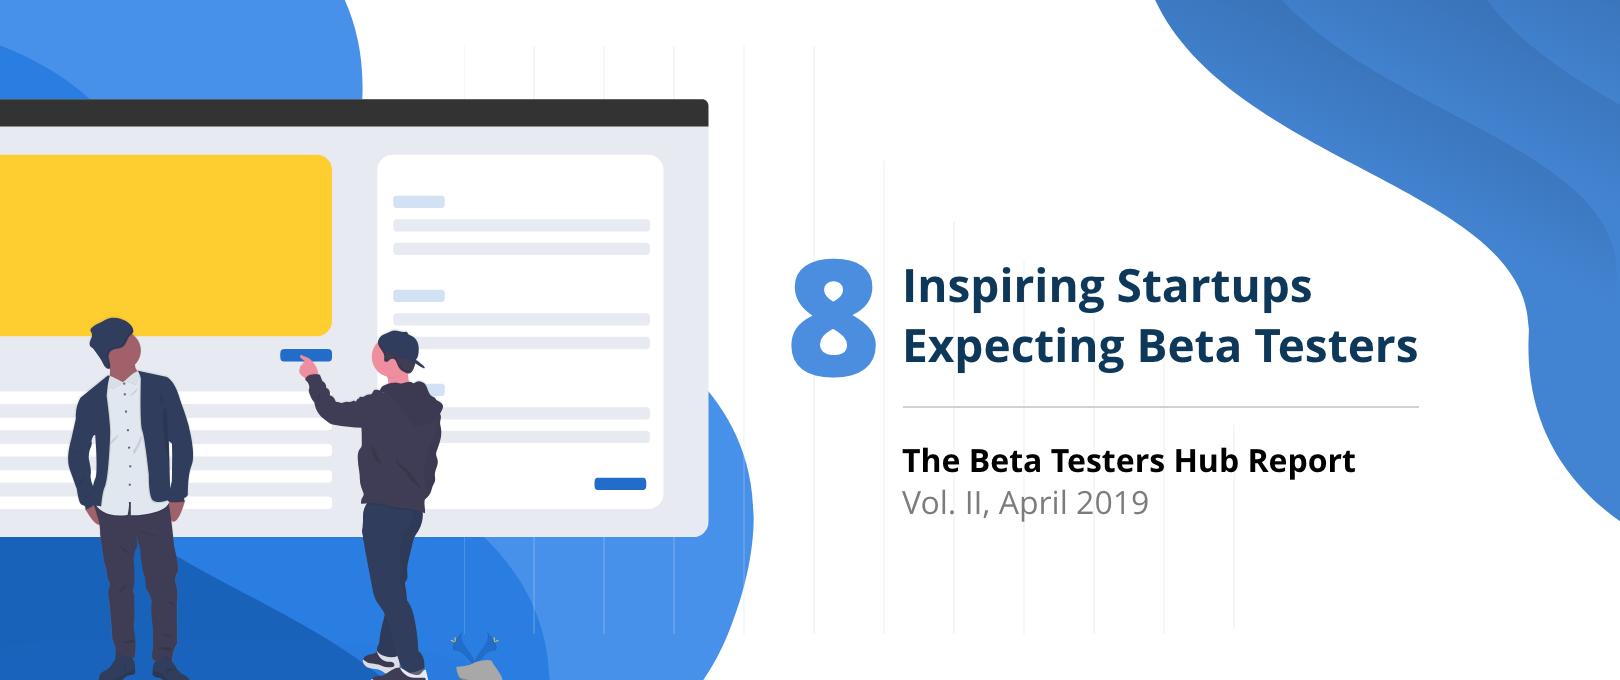 Inspiring Startups Expecting Beta Testers